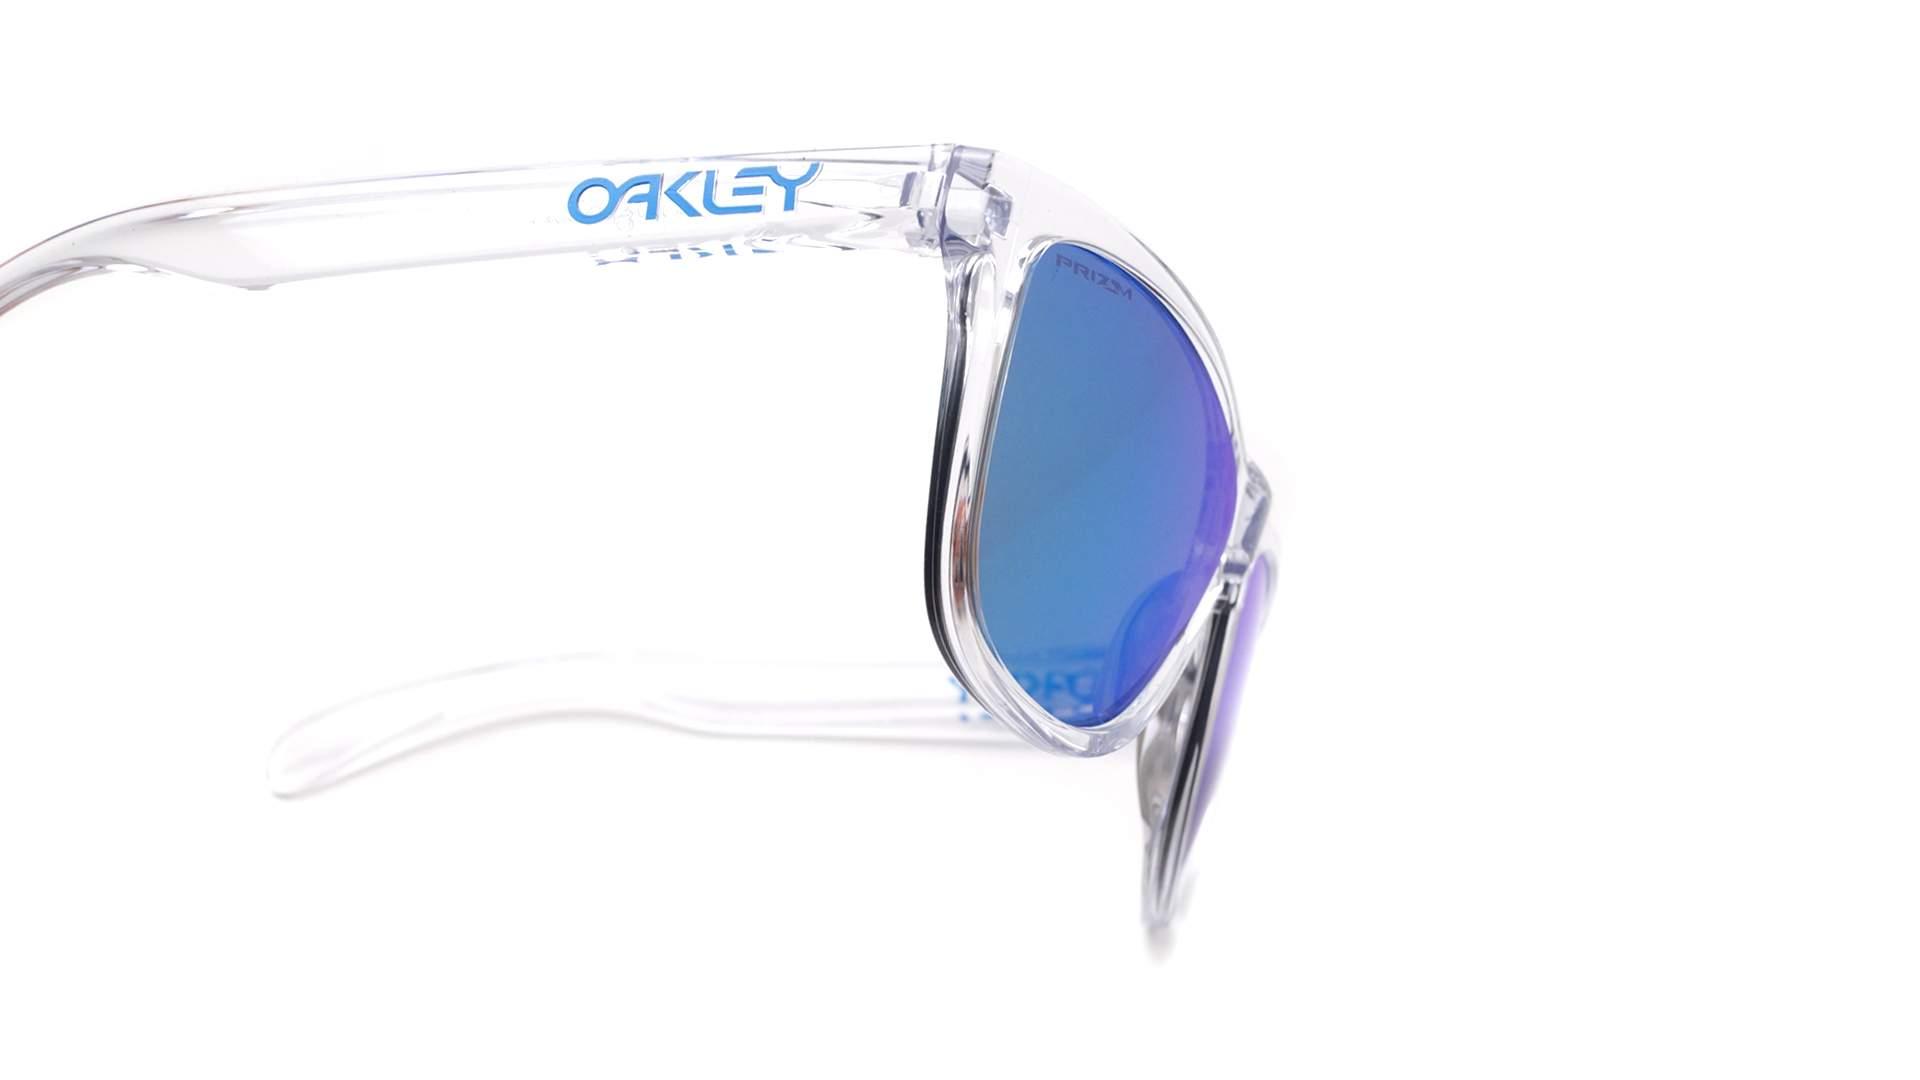 89d06f141 Sunglasses Oakley Frogskins Crystal clear Clear Prizm OO9013 D0 55-17  Medium Mirror